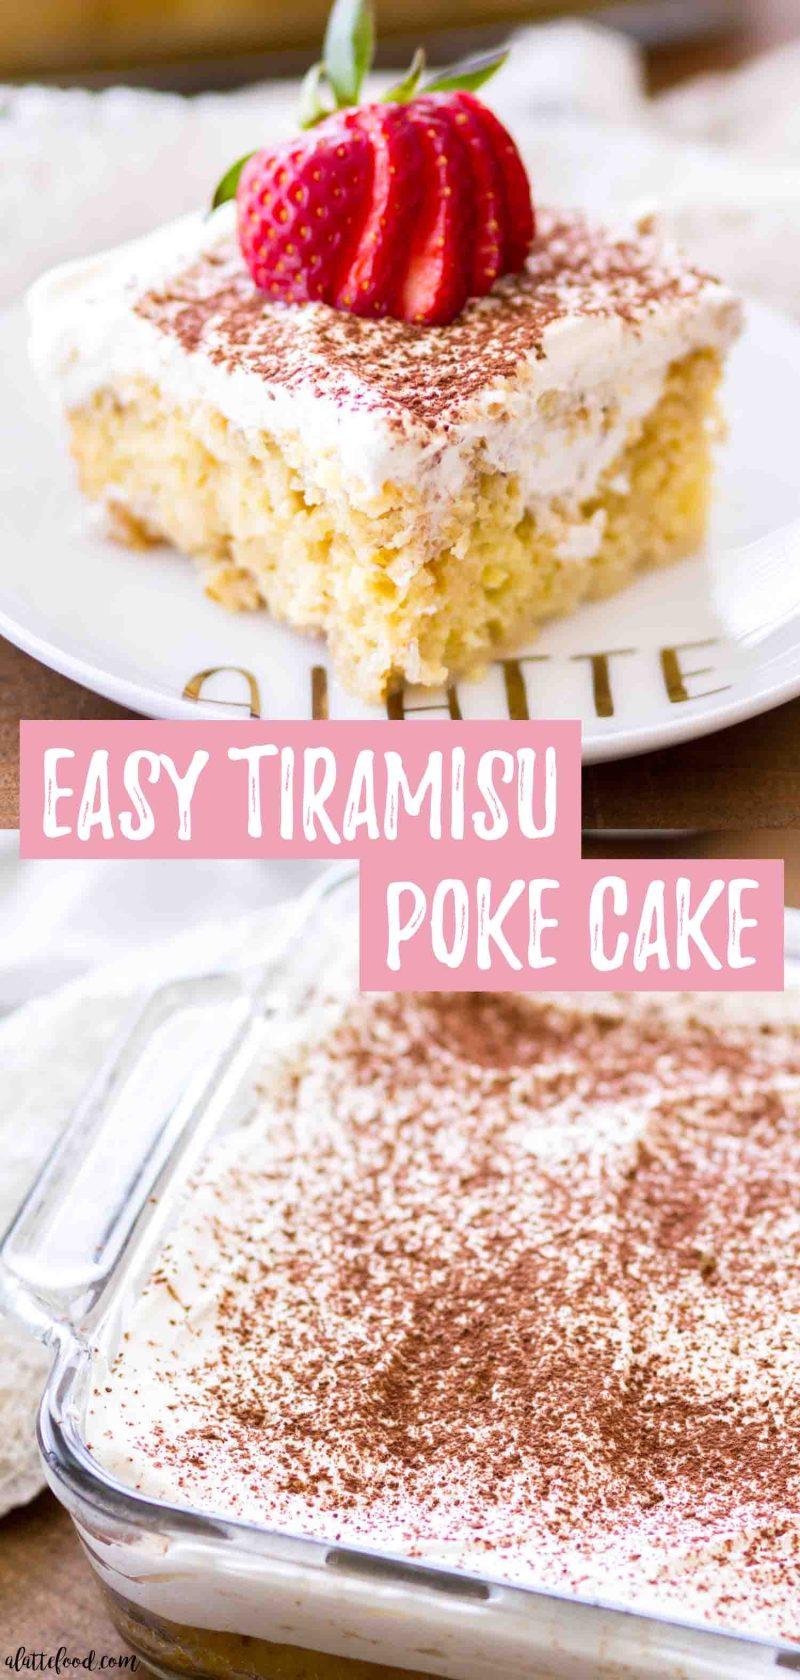 This gorgeous tiramisu cake is an easy tiramisu poke cake recipe that's full of coffee cream, whipped cream frosting, and fresh strawberries.